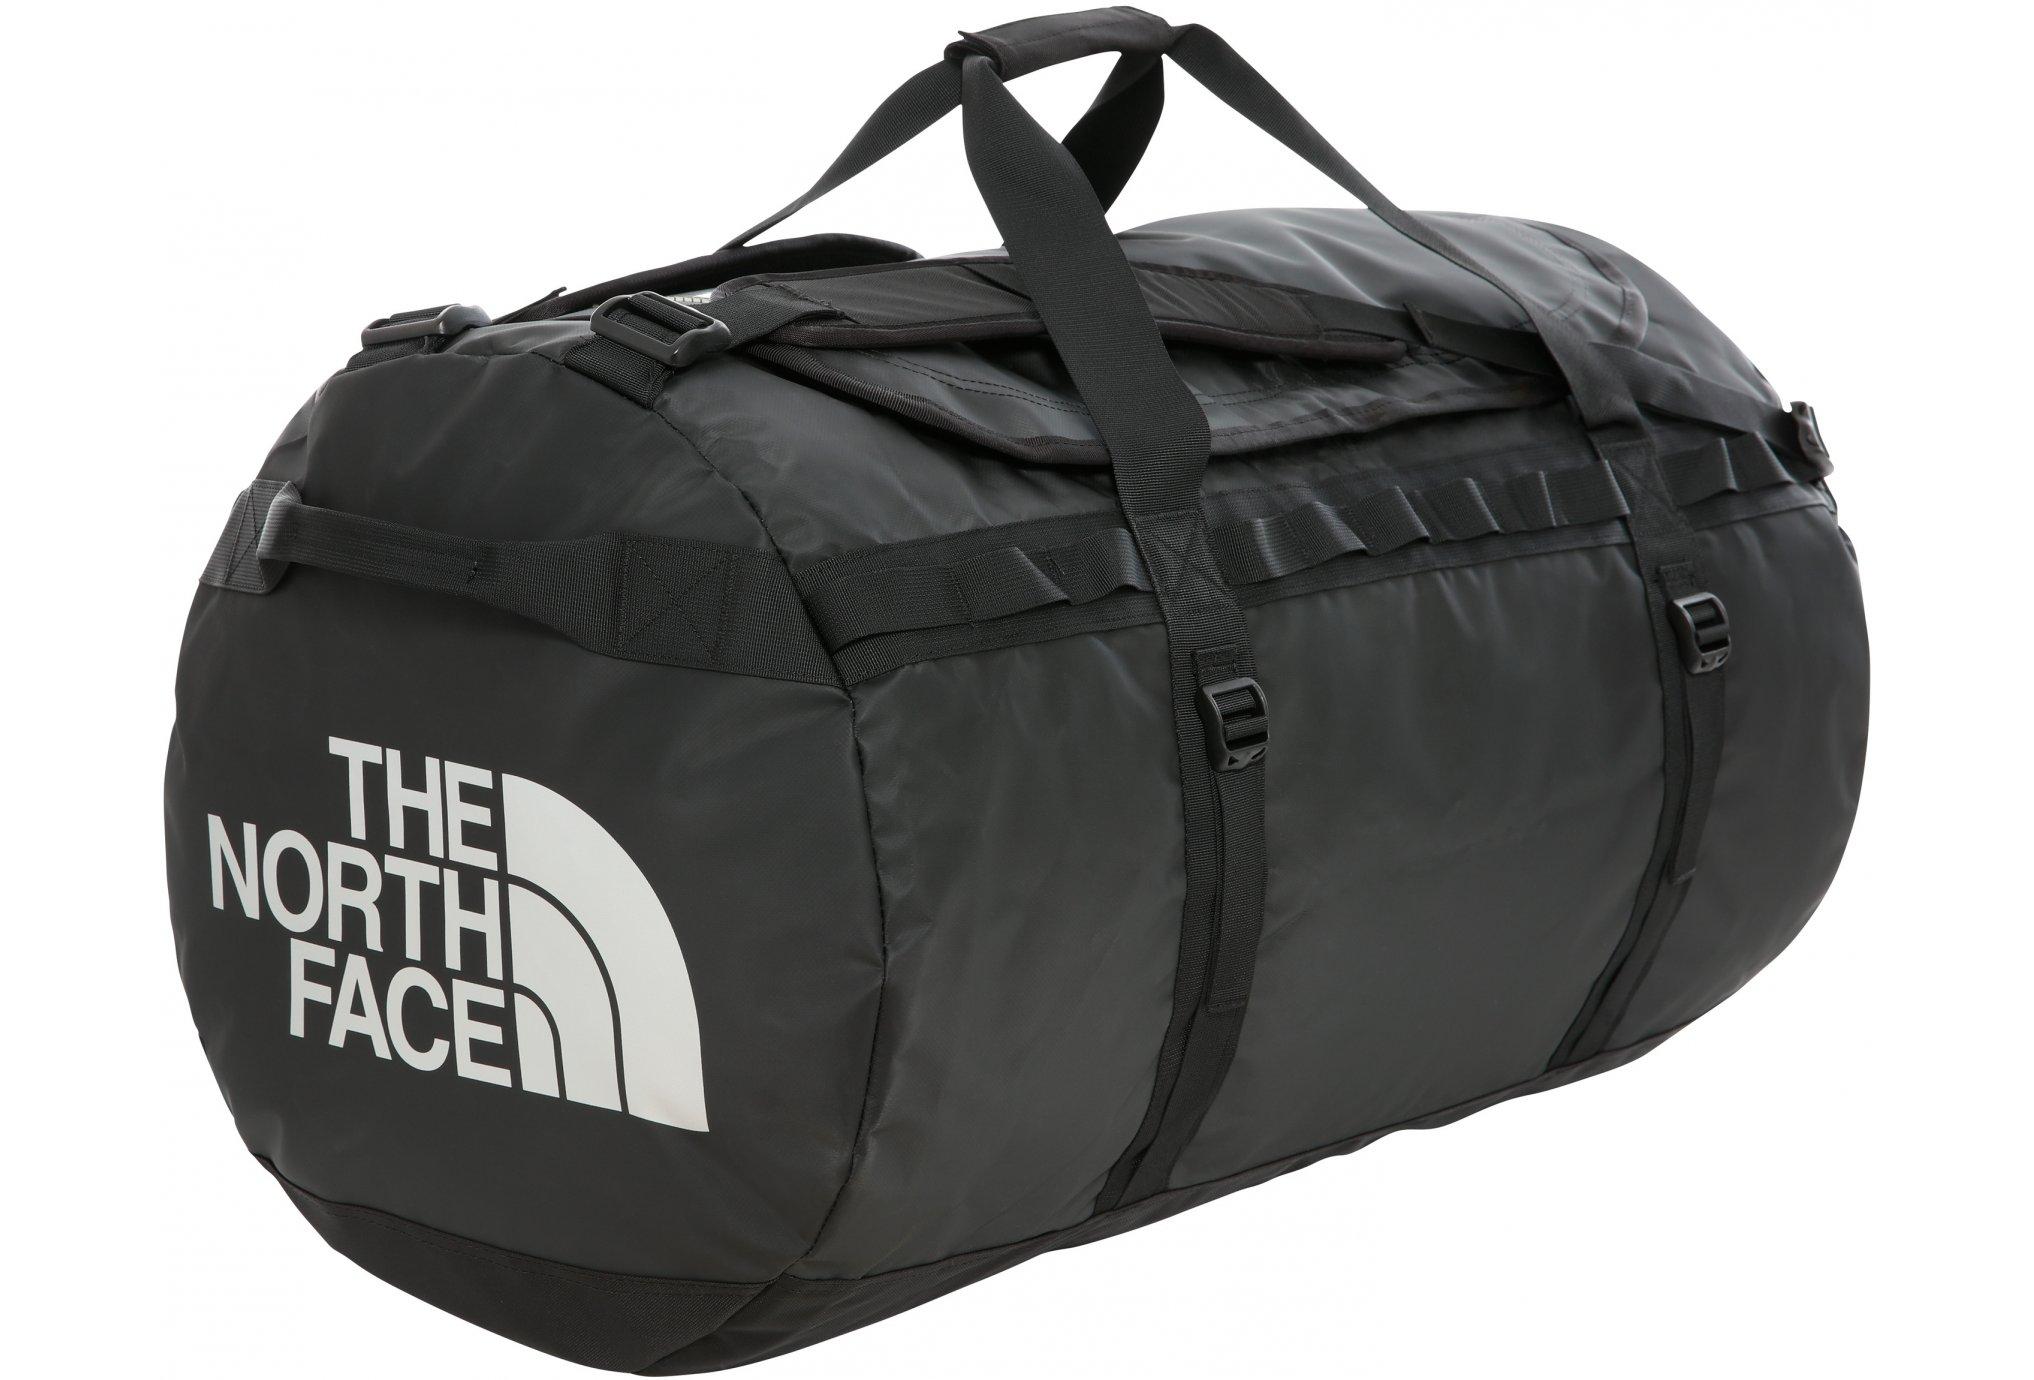 The North Face Base Camp Duffel - XL Sac de sport